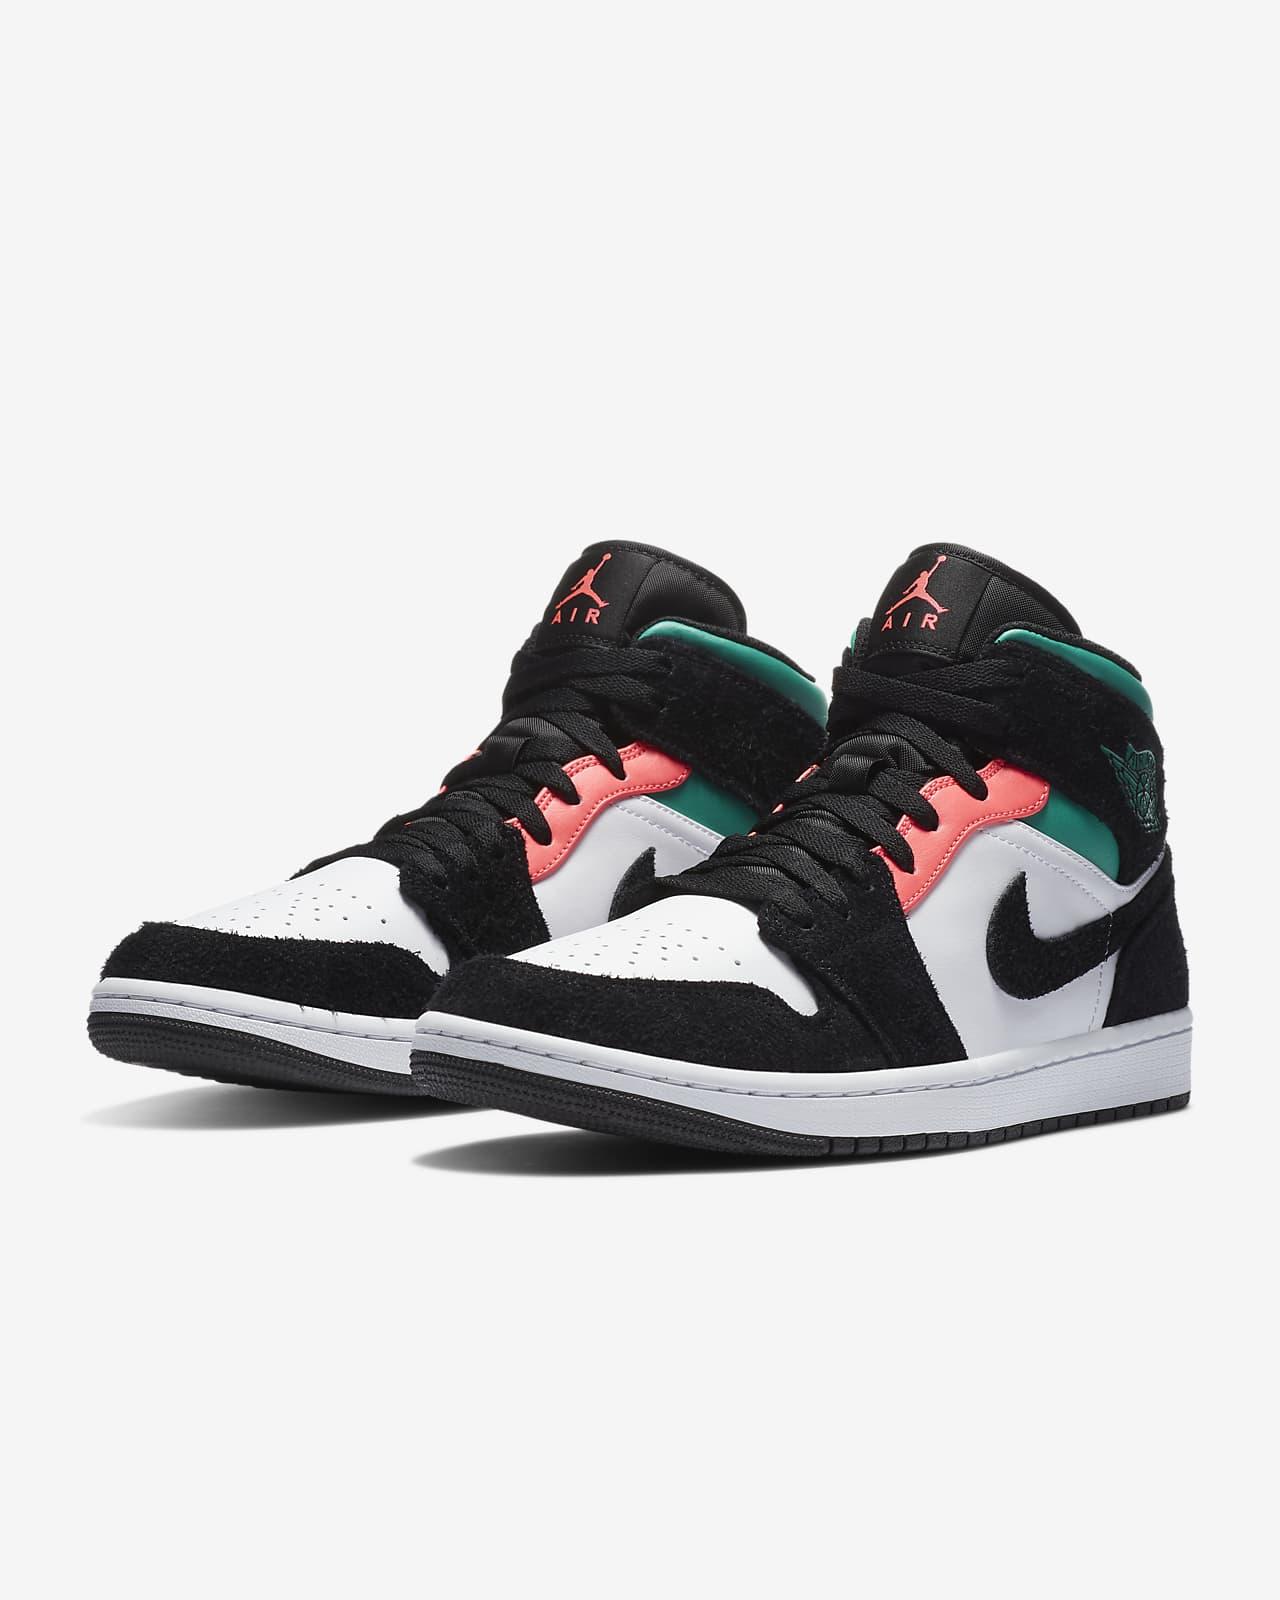 Air Jordan 1 Mid SE Men's Shoe